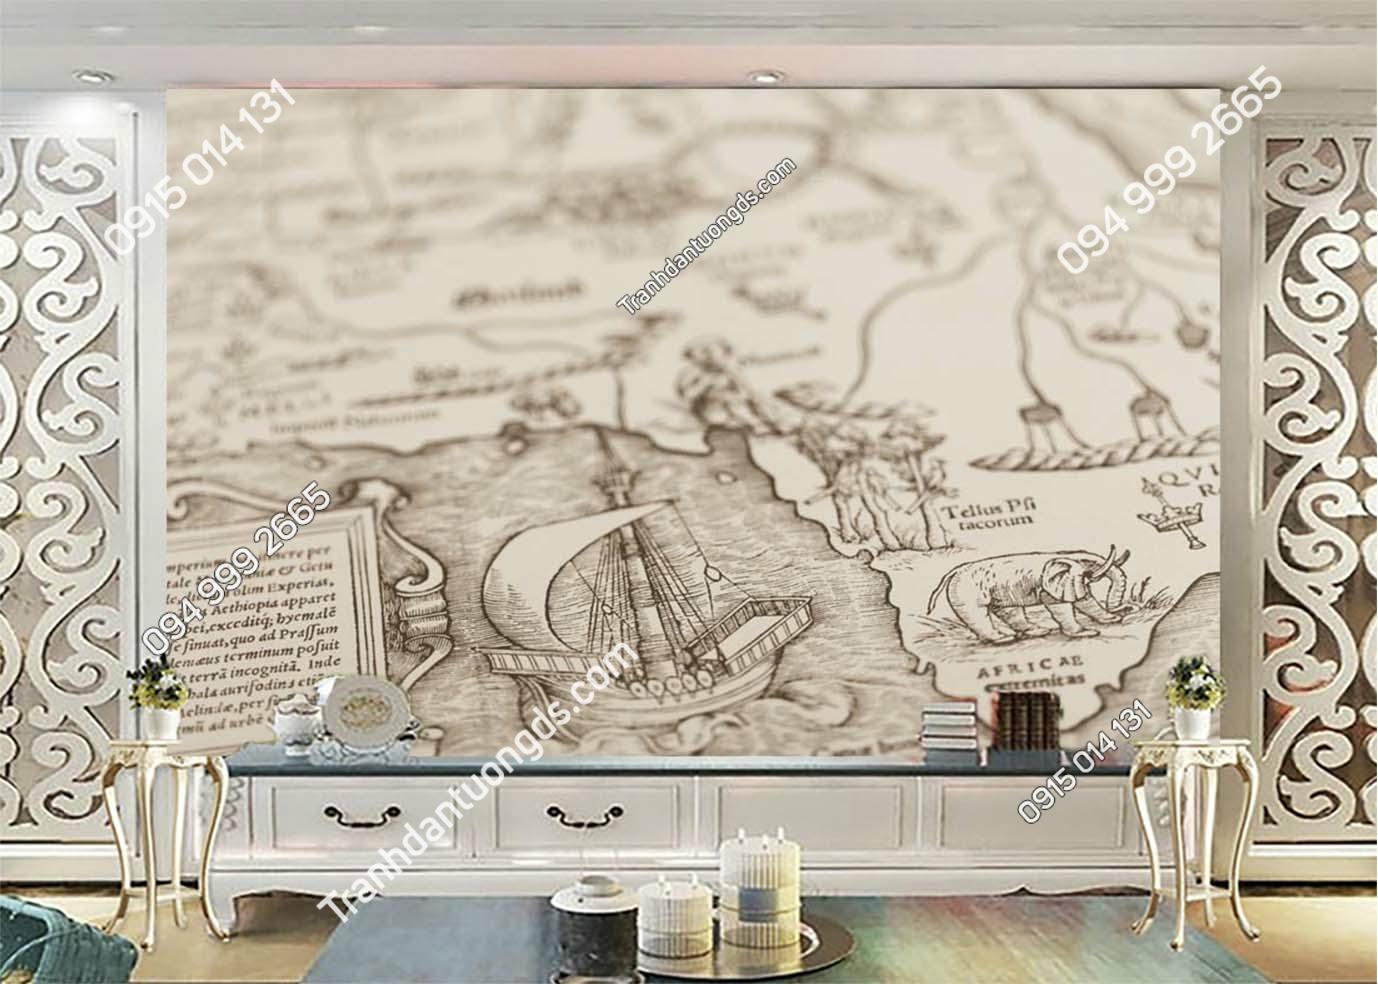 Tranh tường bản đồ kiểu vintage 0018